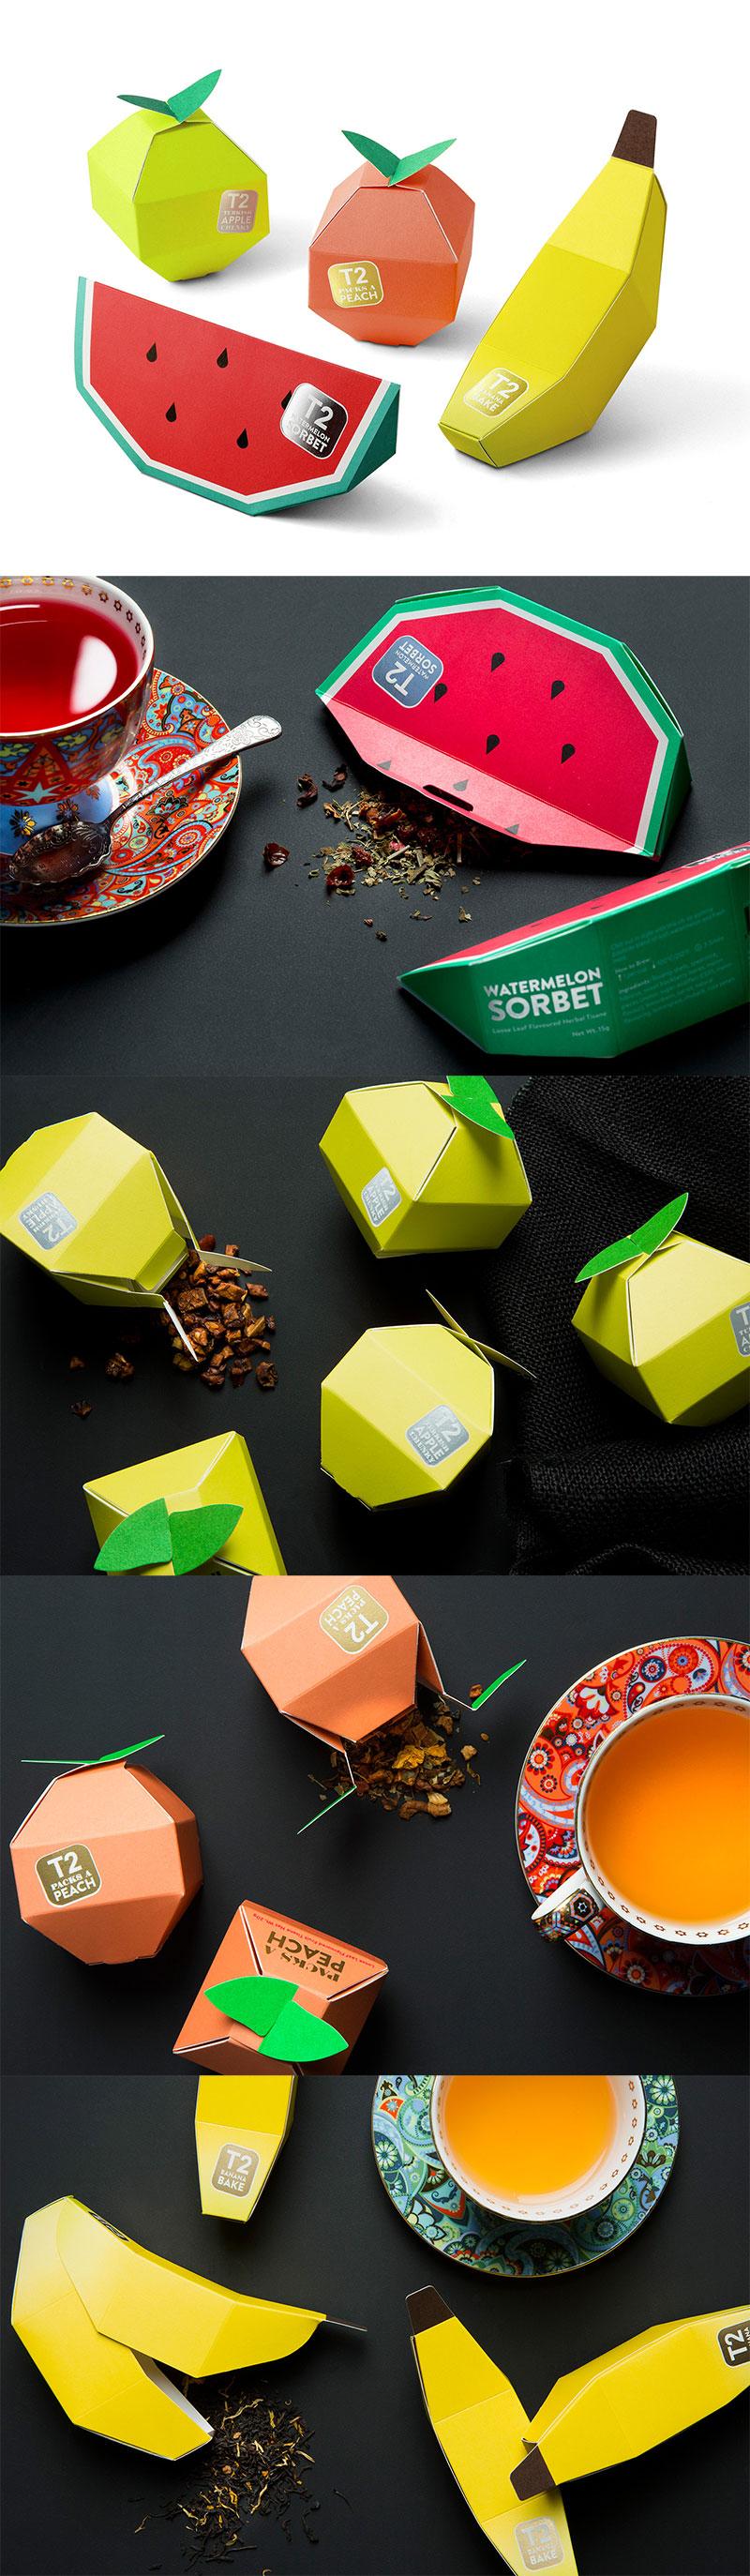 T2 Tea Mini Fruits by Christopher Stanko